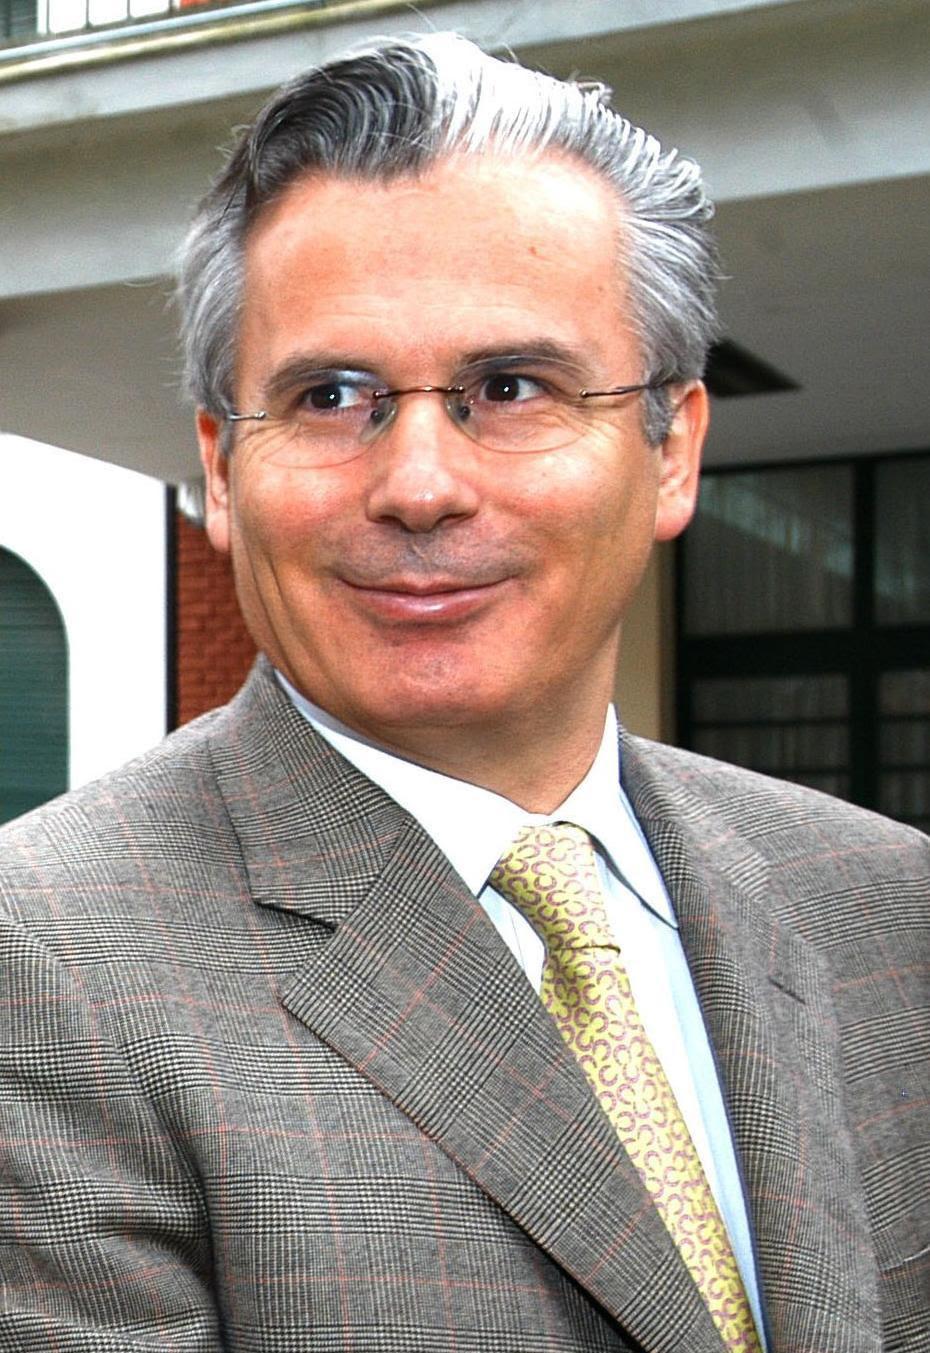 http://jungladecristal.files.wordpress.com/2009/11/baltasar_garzon_-_visitando_esma_-_argentina_-_1ago05_-presidenciagovar_recortada.jpg